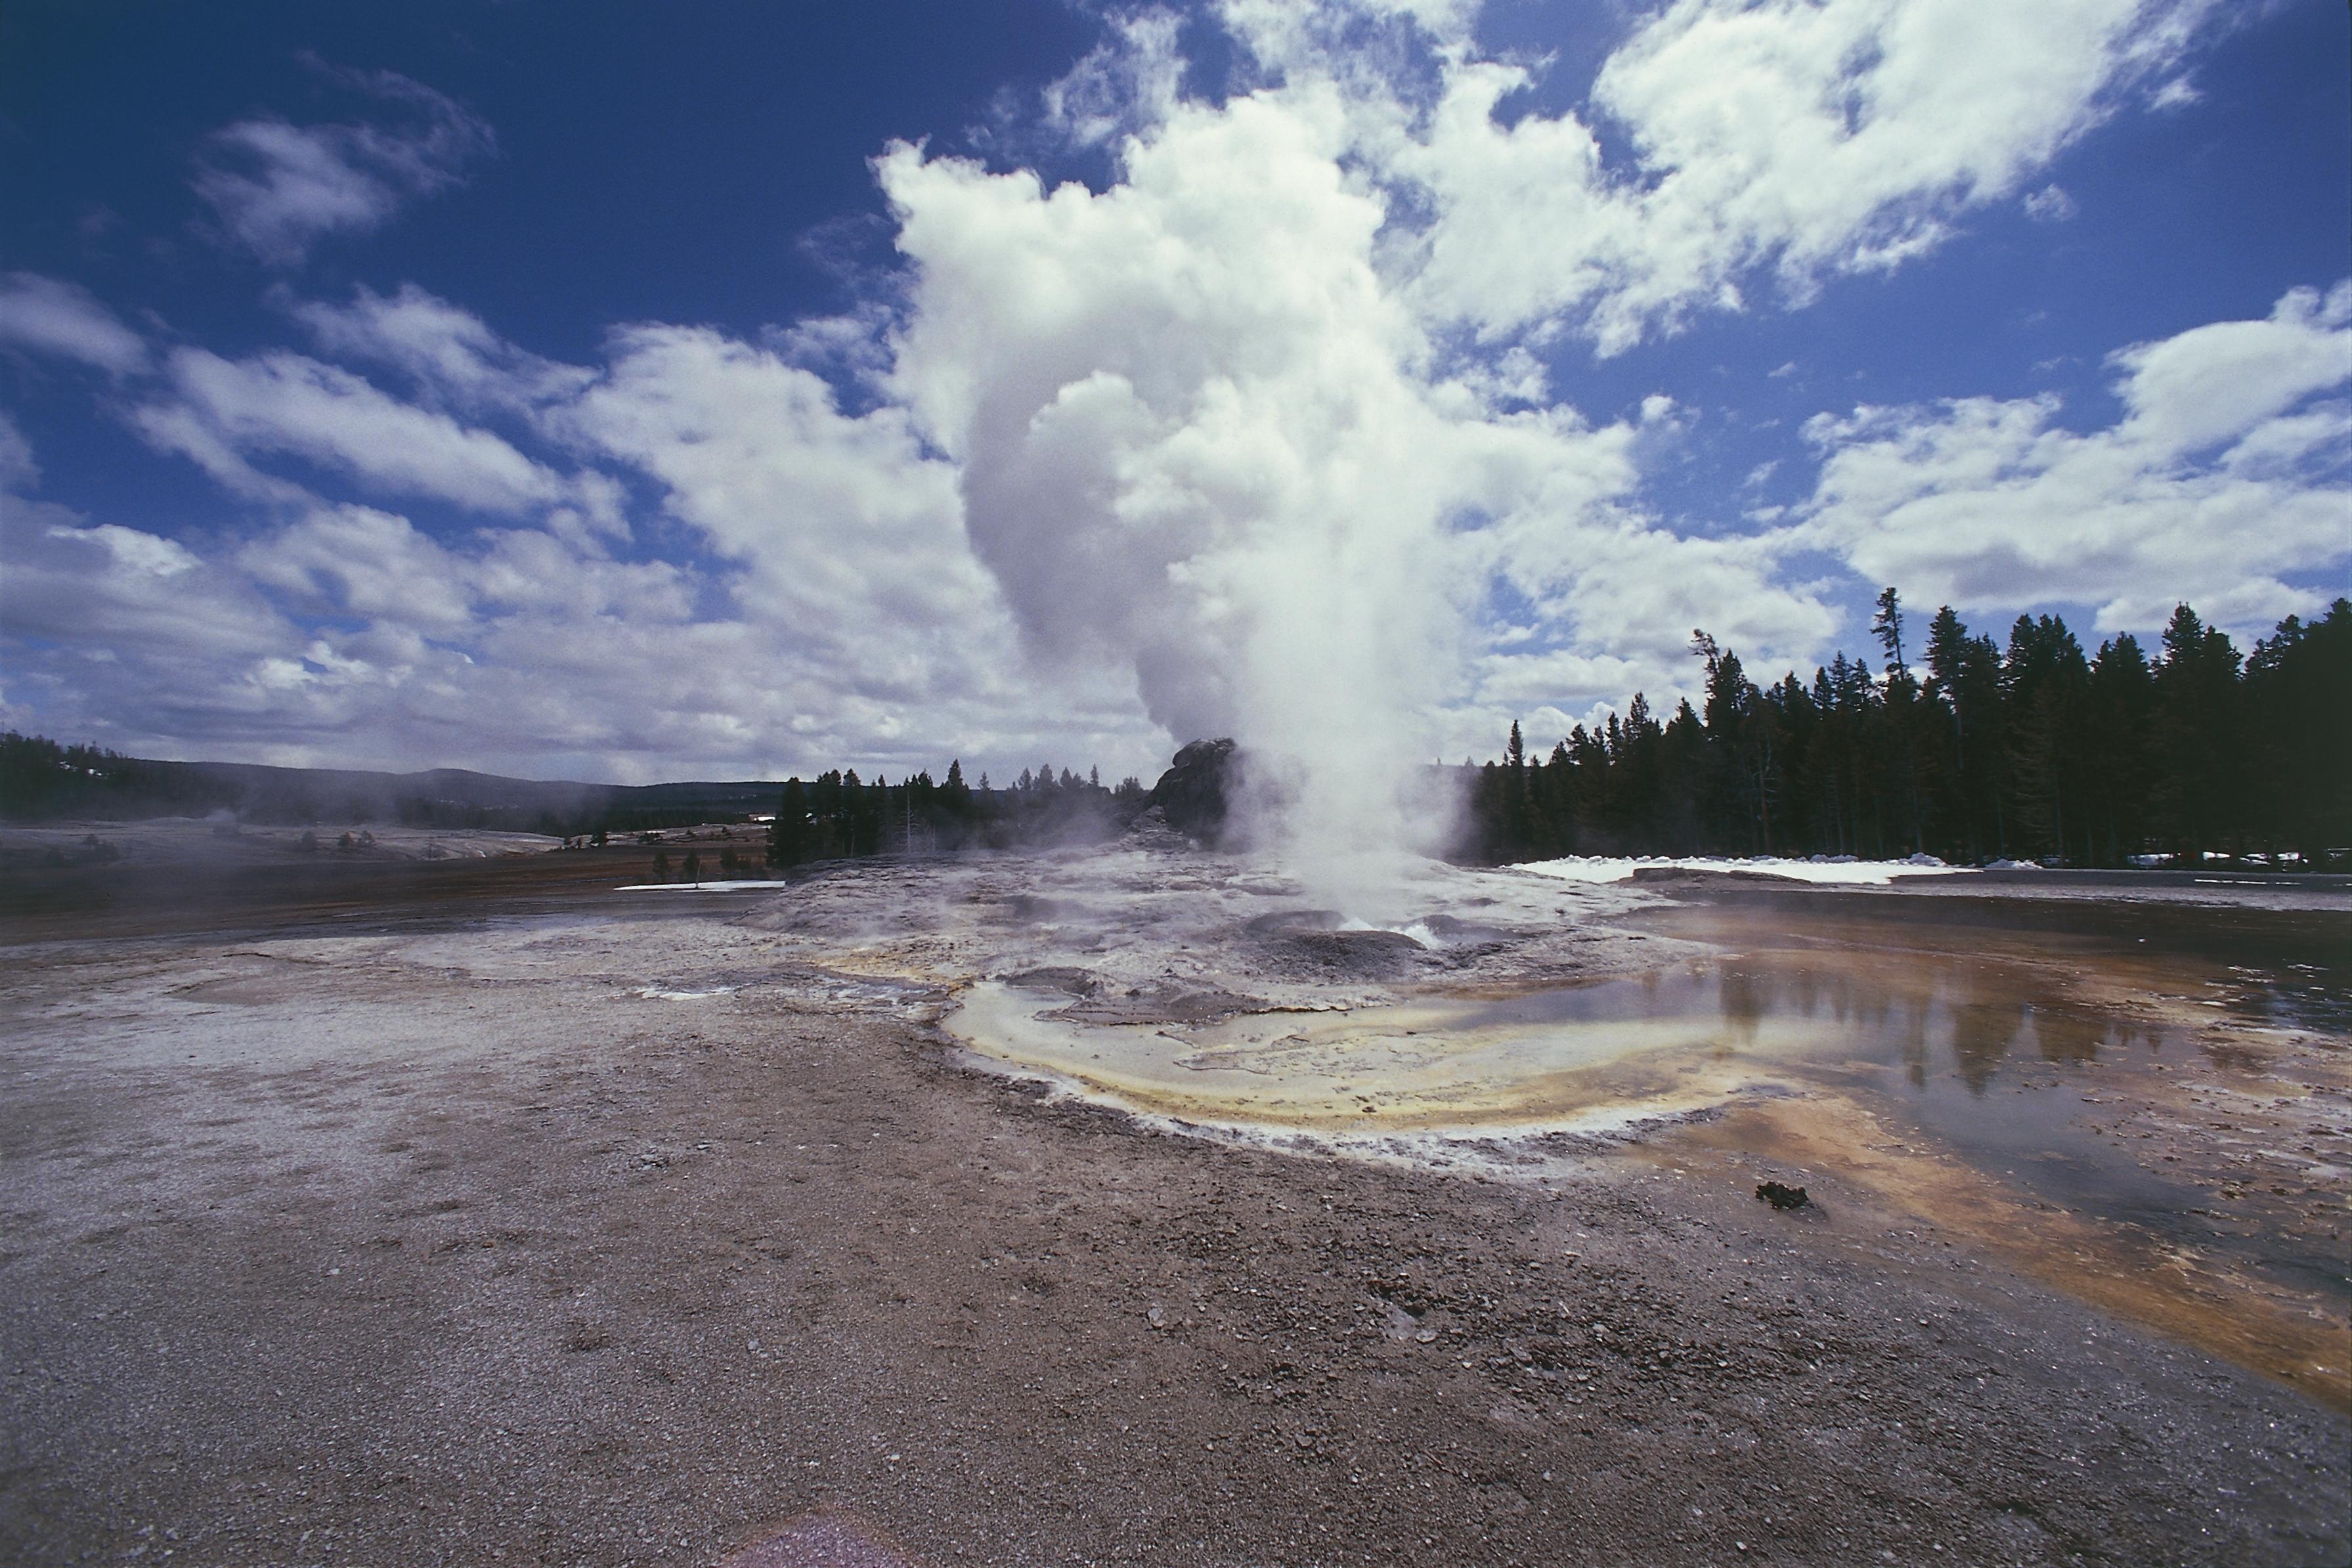 Yellowstone National Park (UNESCO World Heritage List, 1976). Region of geysers, Castle Geyser